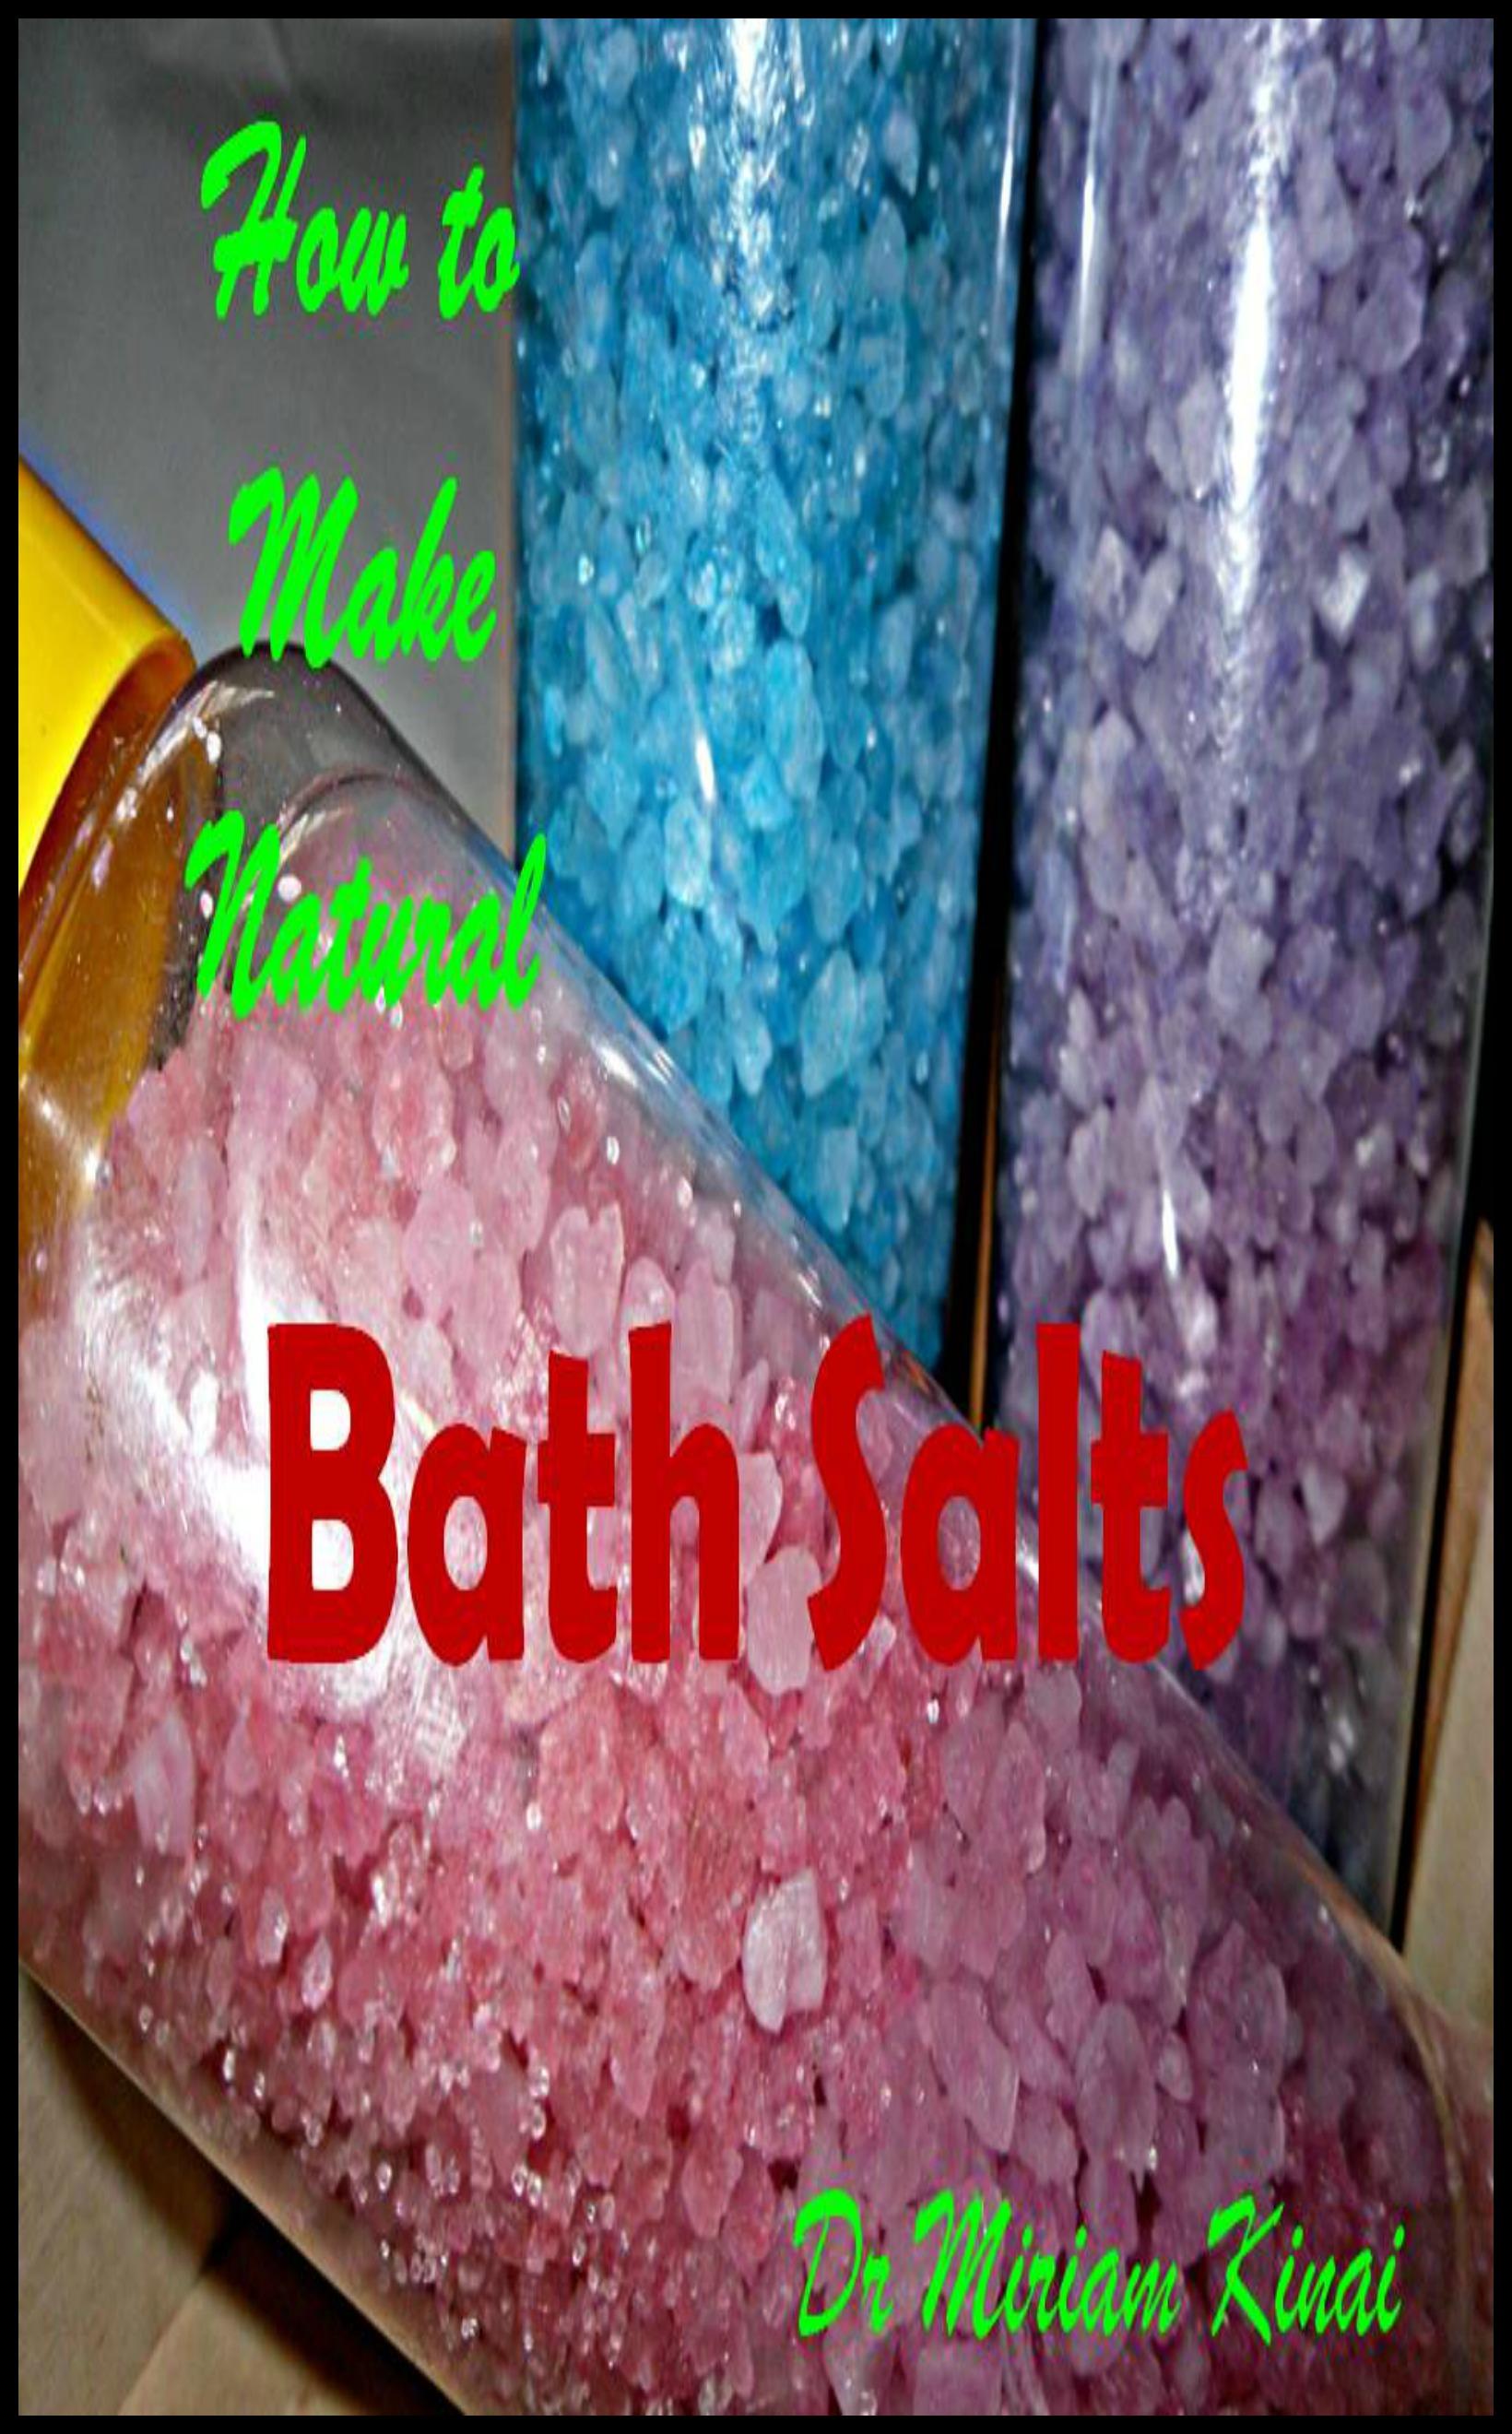 how to make professional bath salts